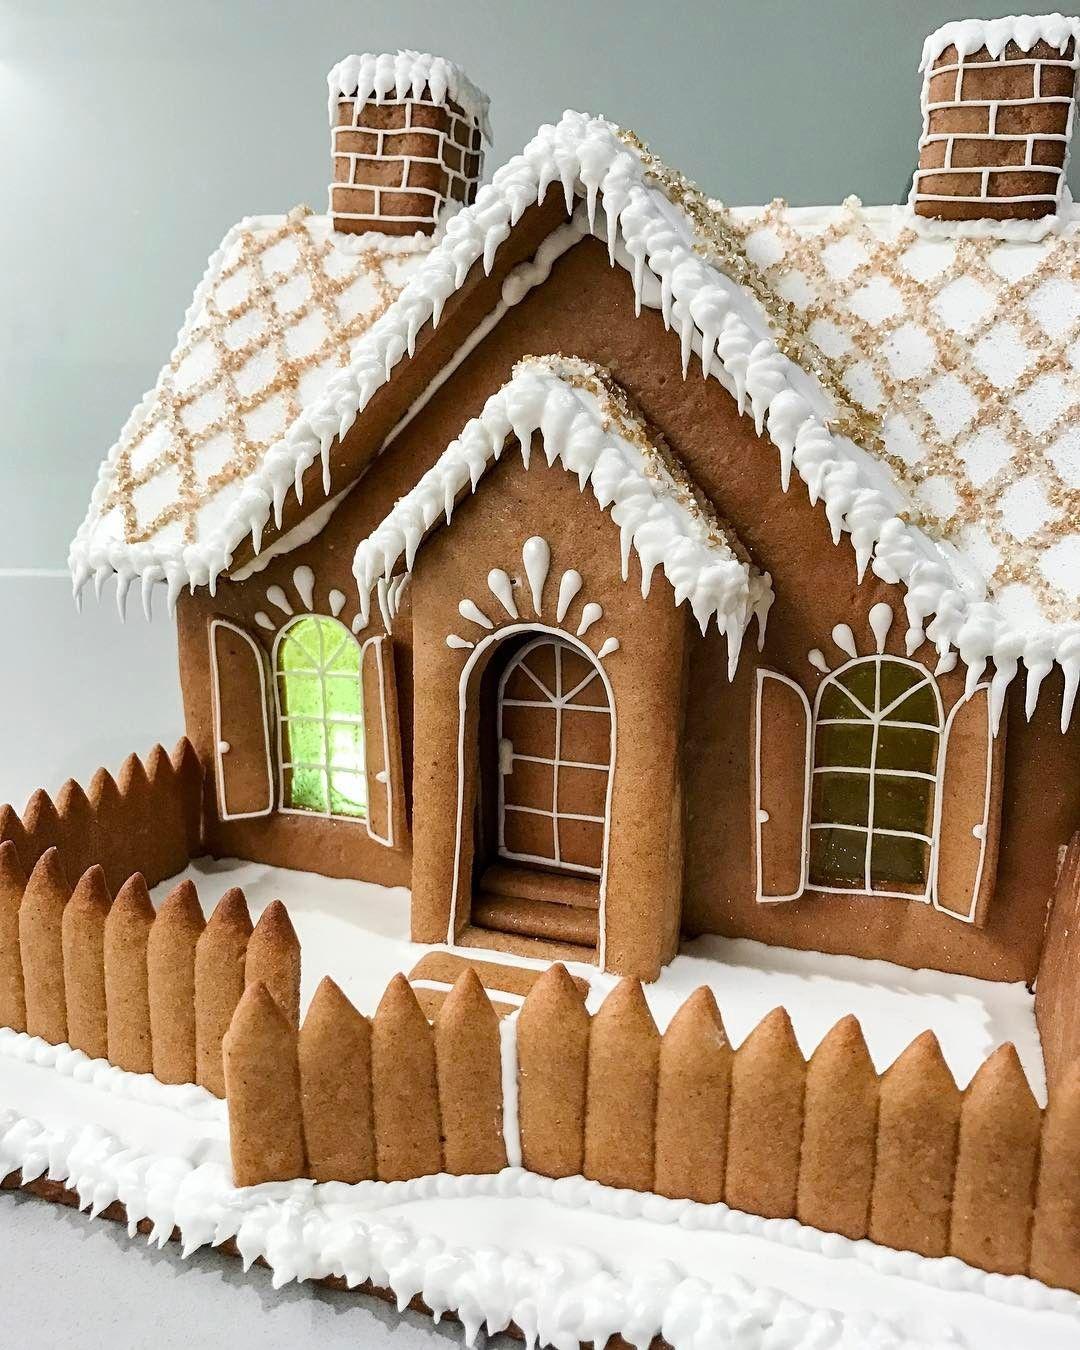 Simple frosting details christmas gingerbread house - Maison en biscuit et bonbons ...